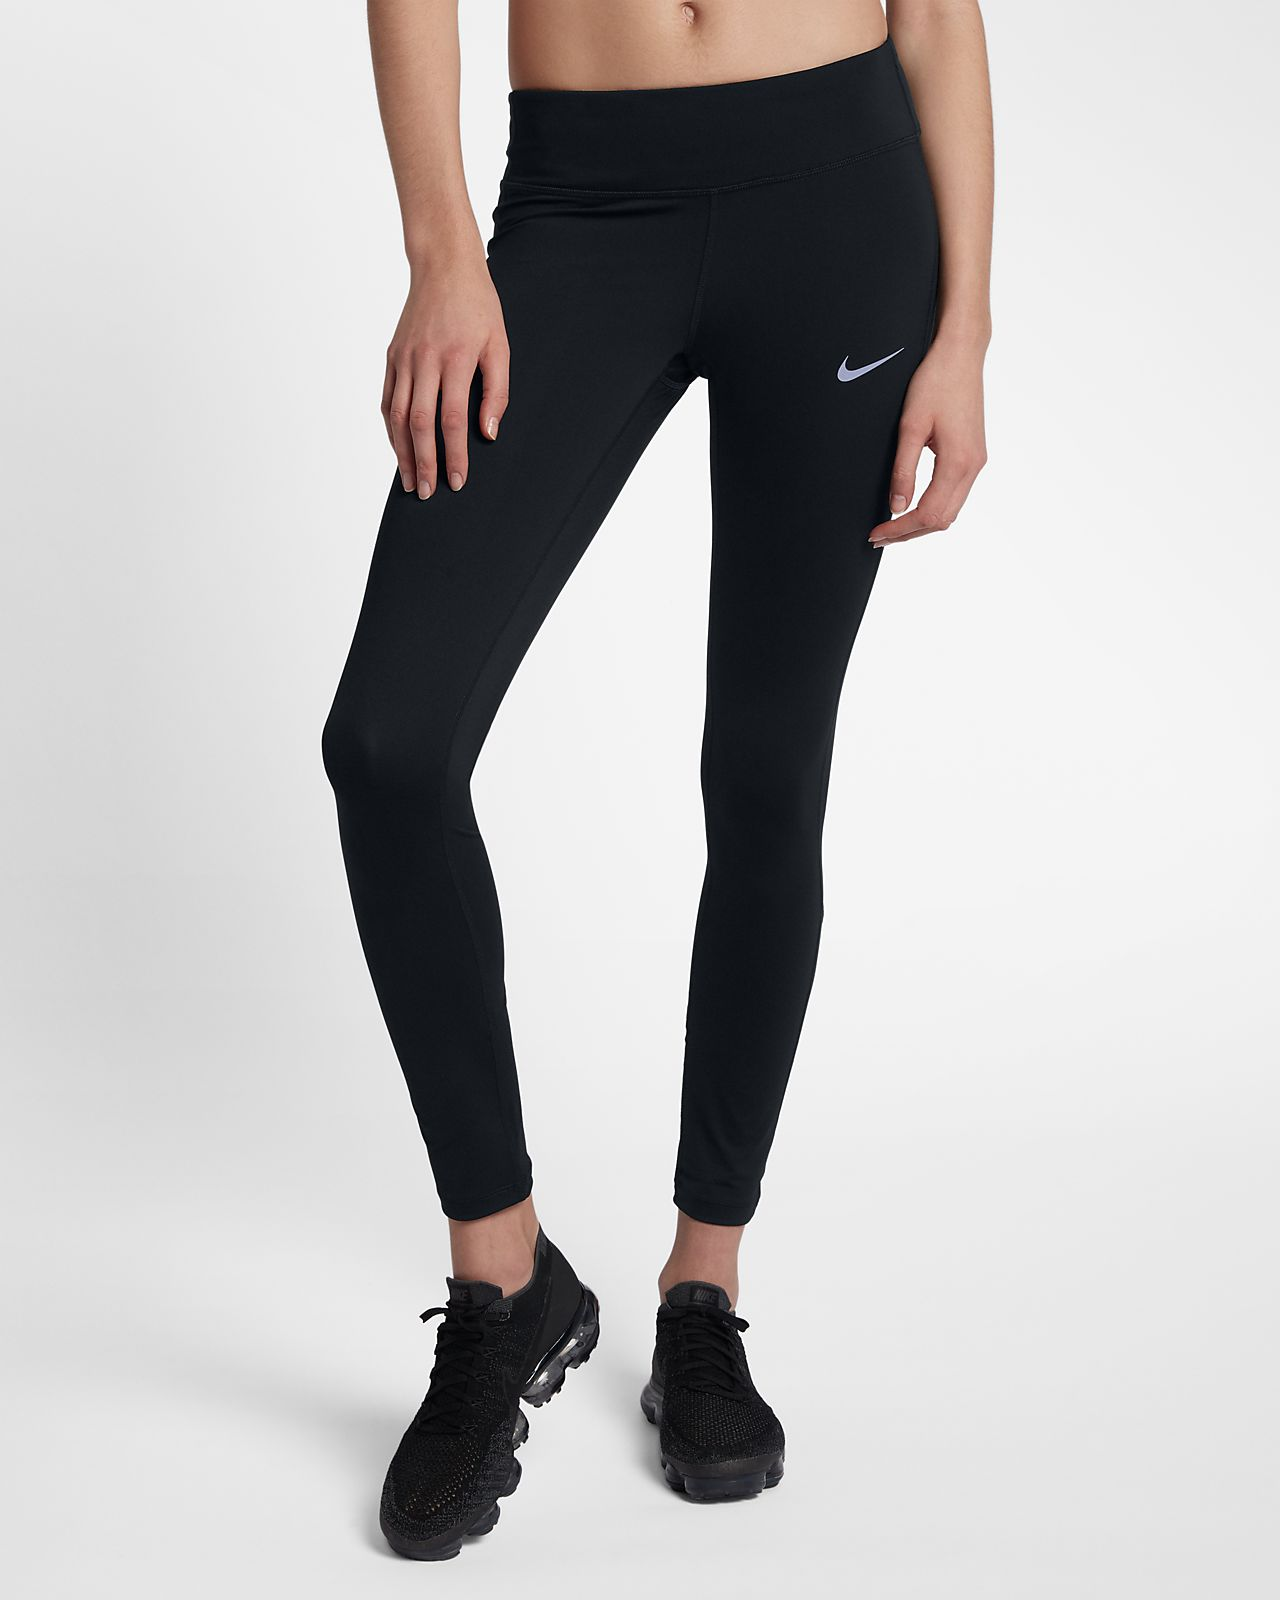 e223bbf917a Nike Racer Hardlooptights met halfhoge taille voor dames. Nike.com NL